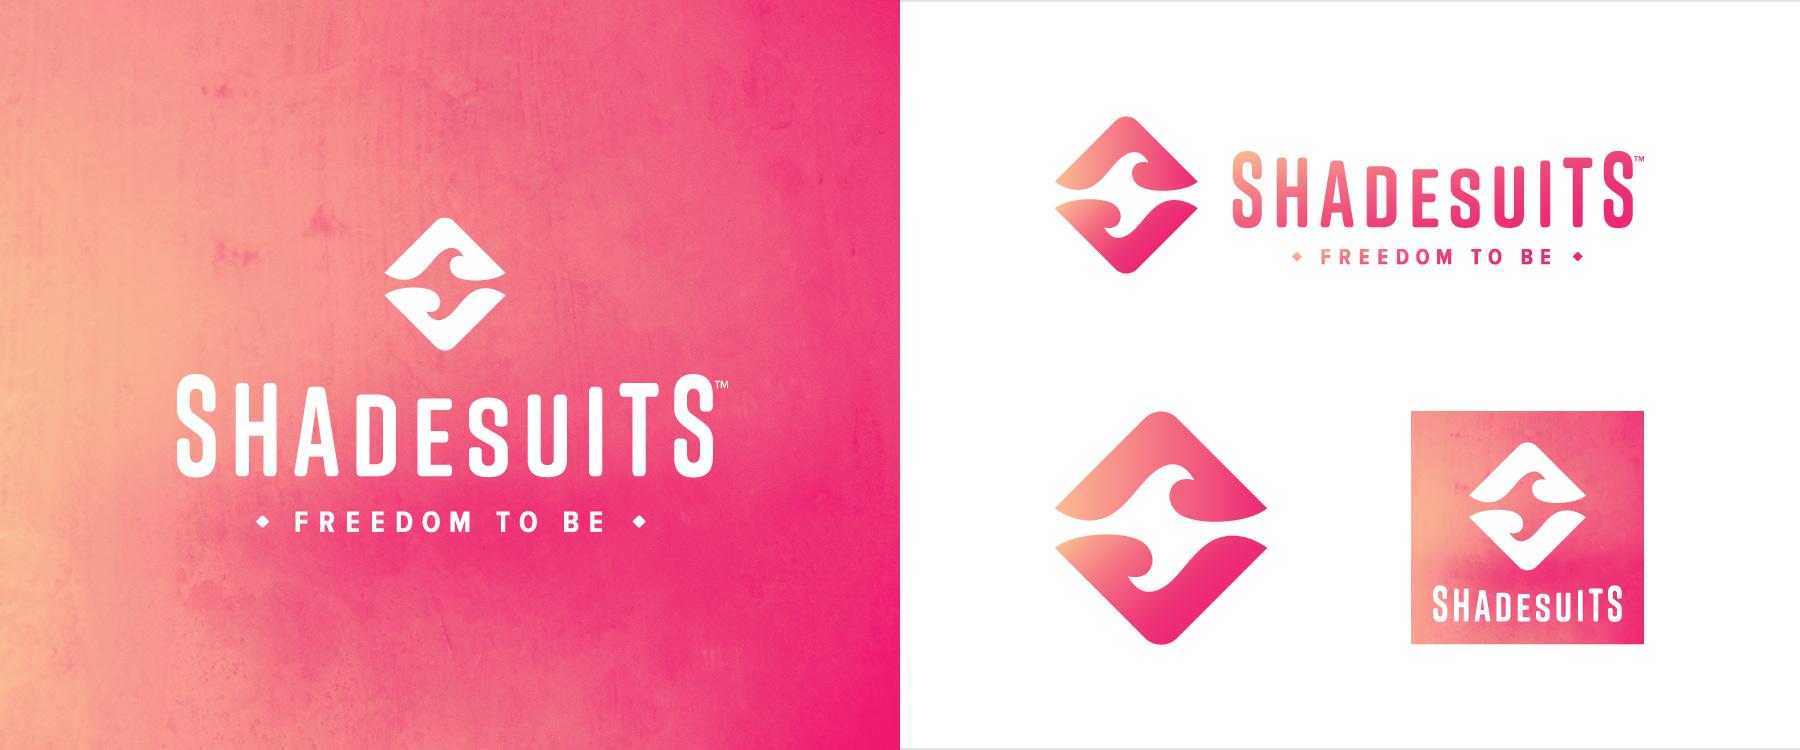 ShadeSuits-Brand-Board.jpg